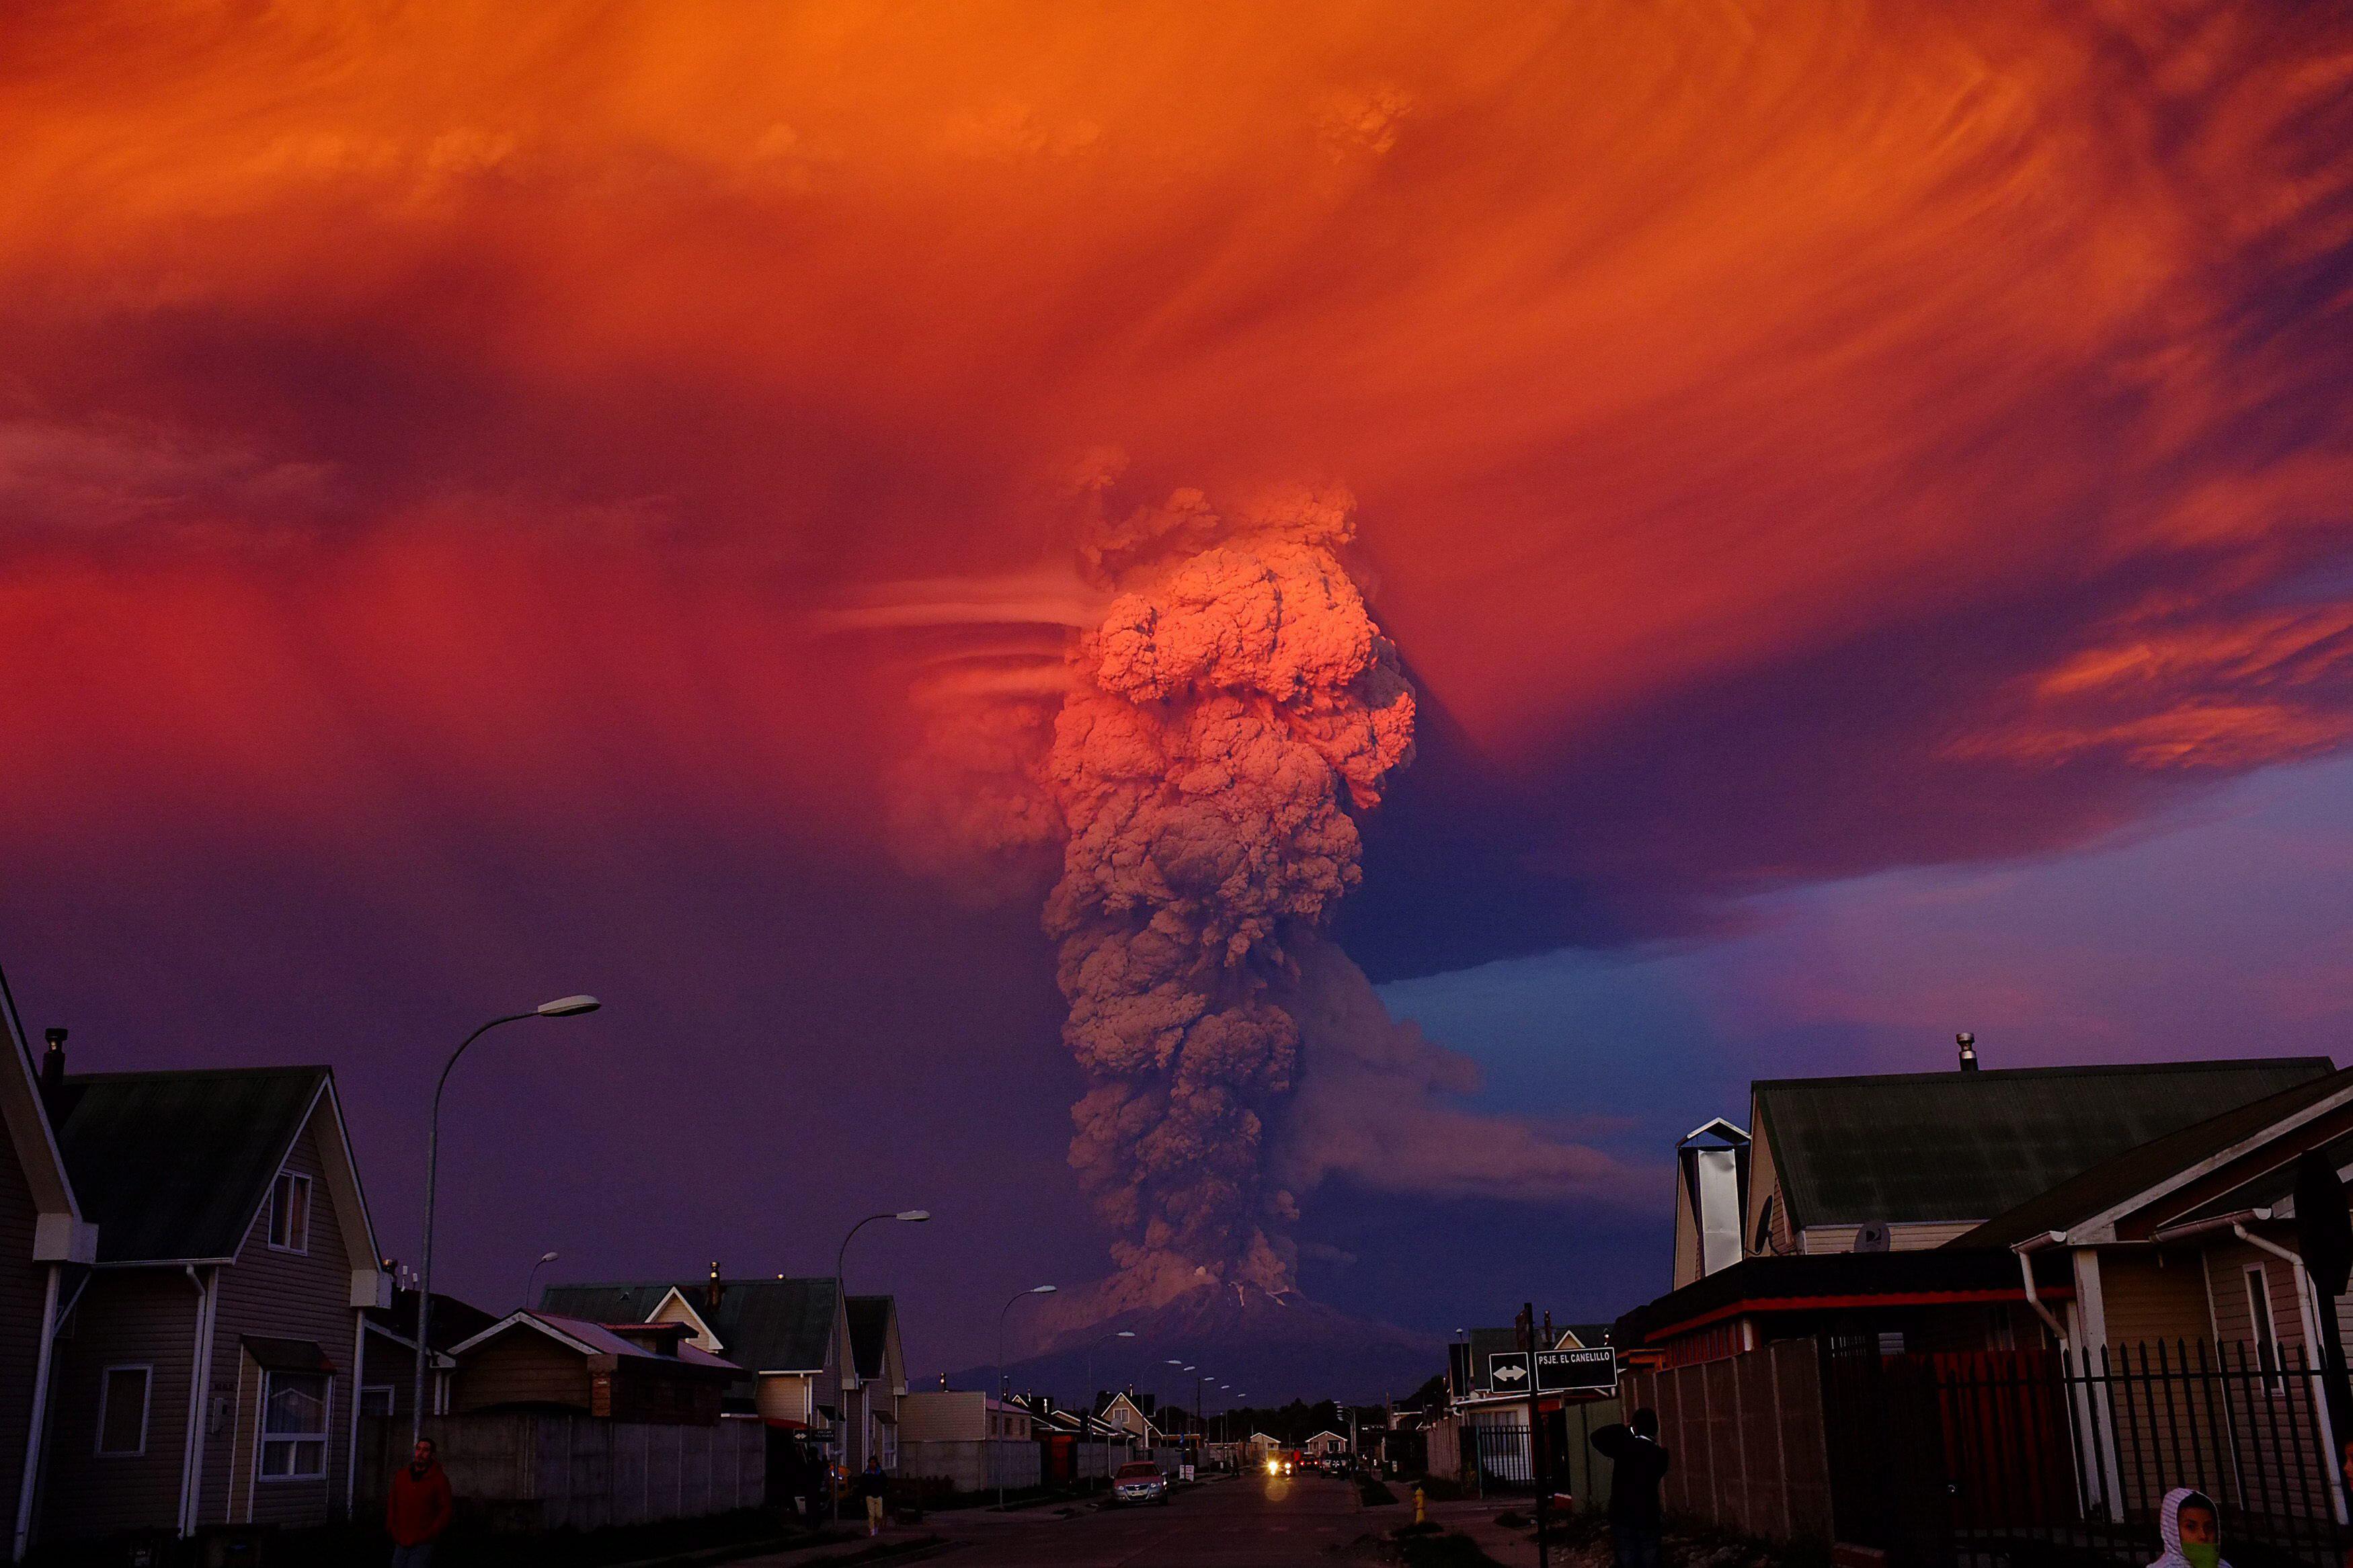 The sun illuminates ash from the Calbuco volcano on April 22, 2015.